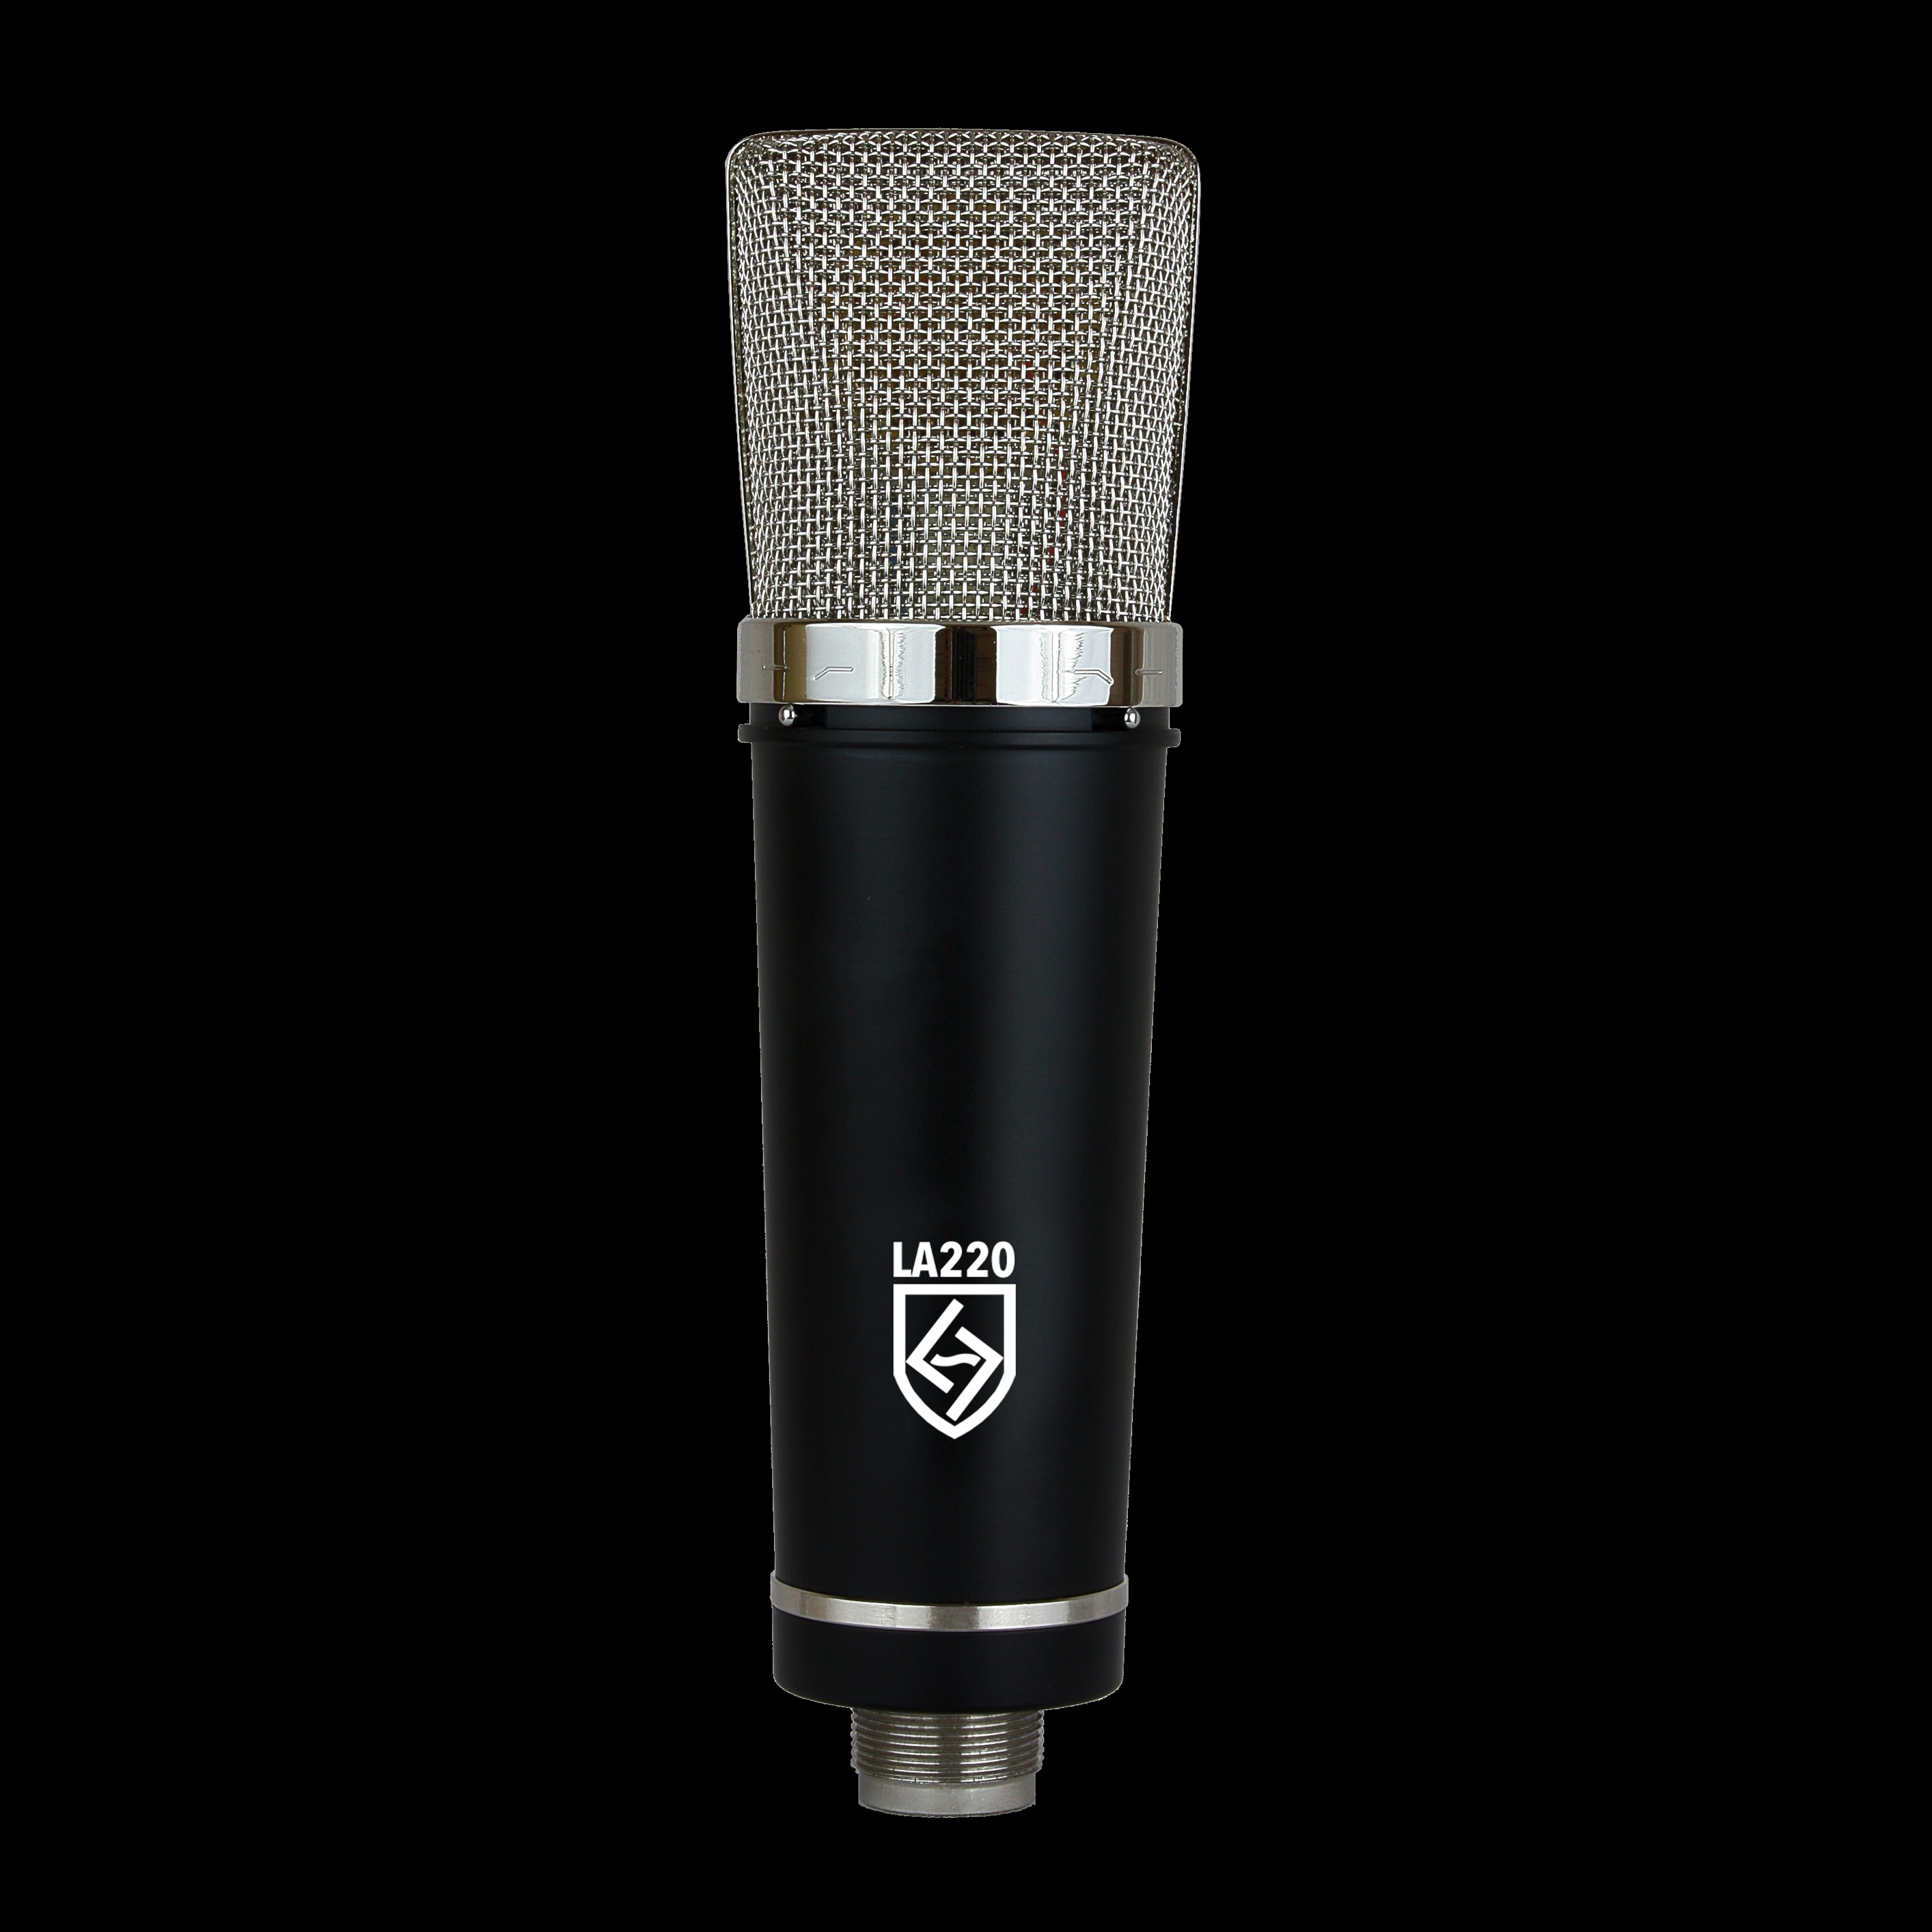 Professional Microphones Lauten Audio Condenser Microphone Ribbon Diagram Msrp 49900 The Series Black La 220 Large Diaphragm Fet Studio By Is A